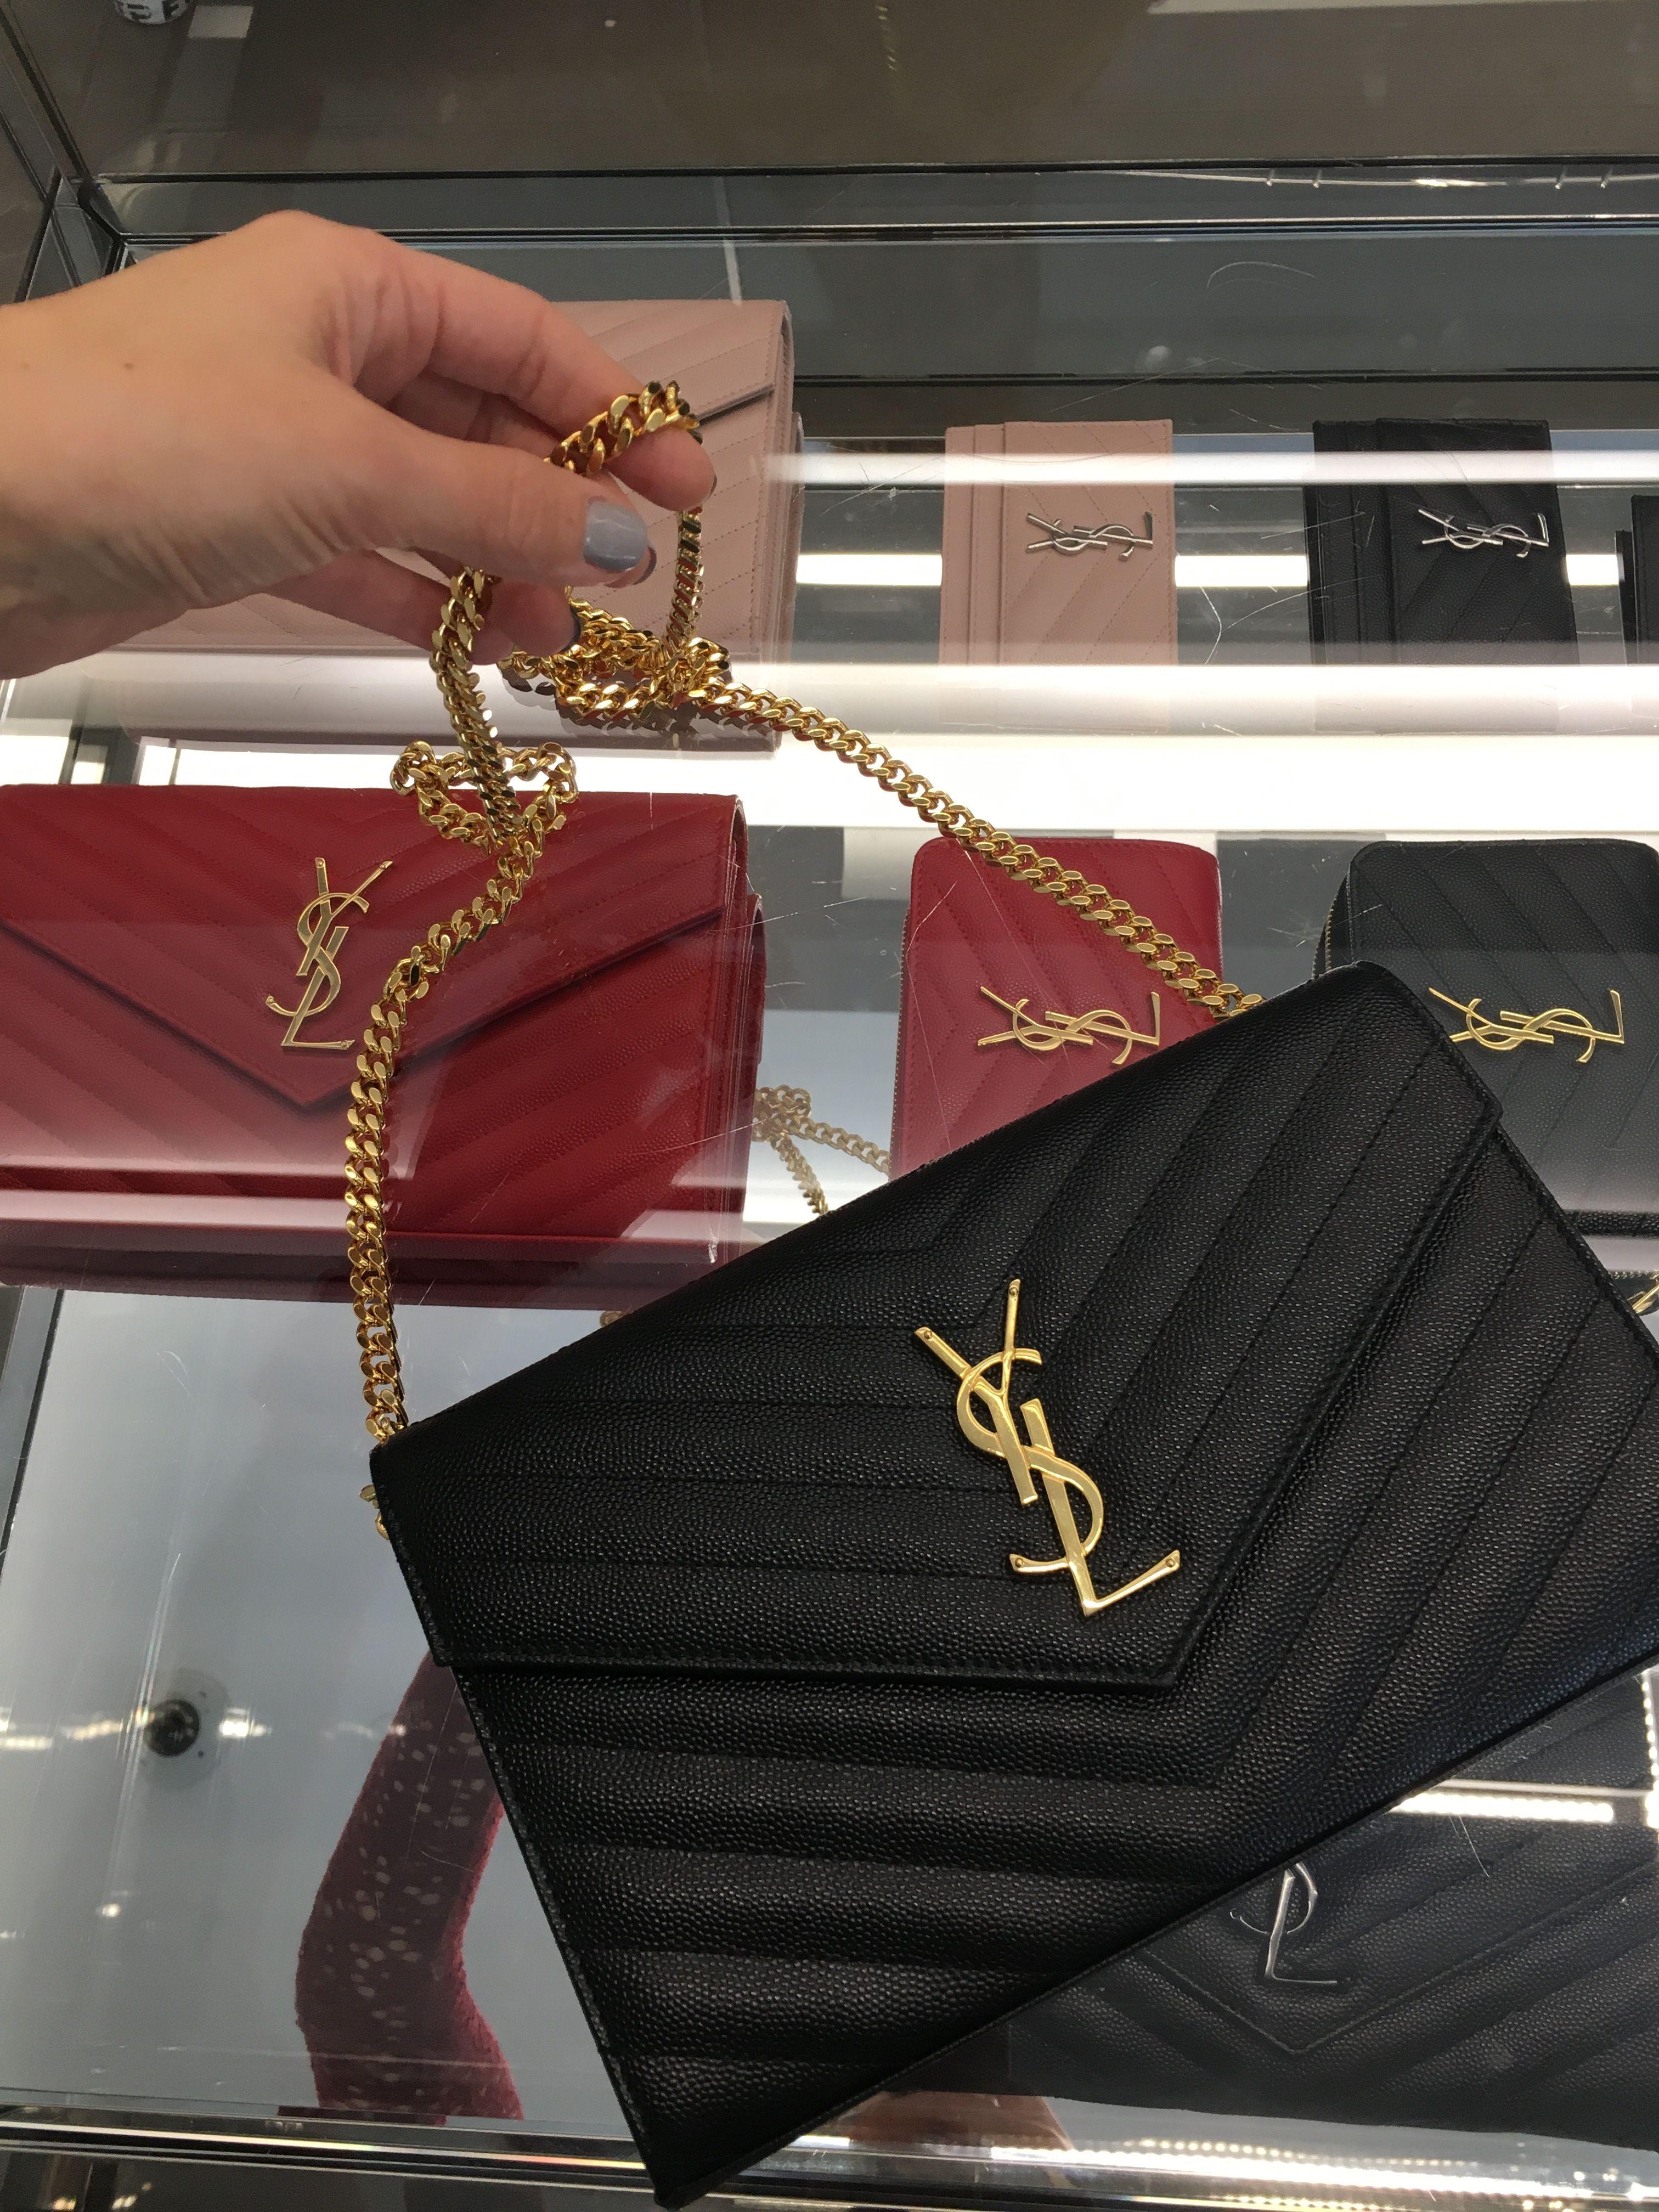 dacb7de8ef Saint Laurent black monogram chain wallet $1650 @ ysl.com My dream  crossbody purse